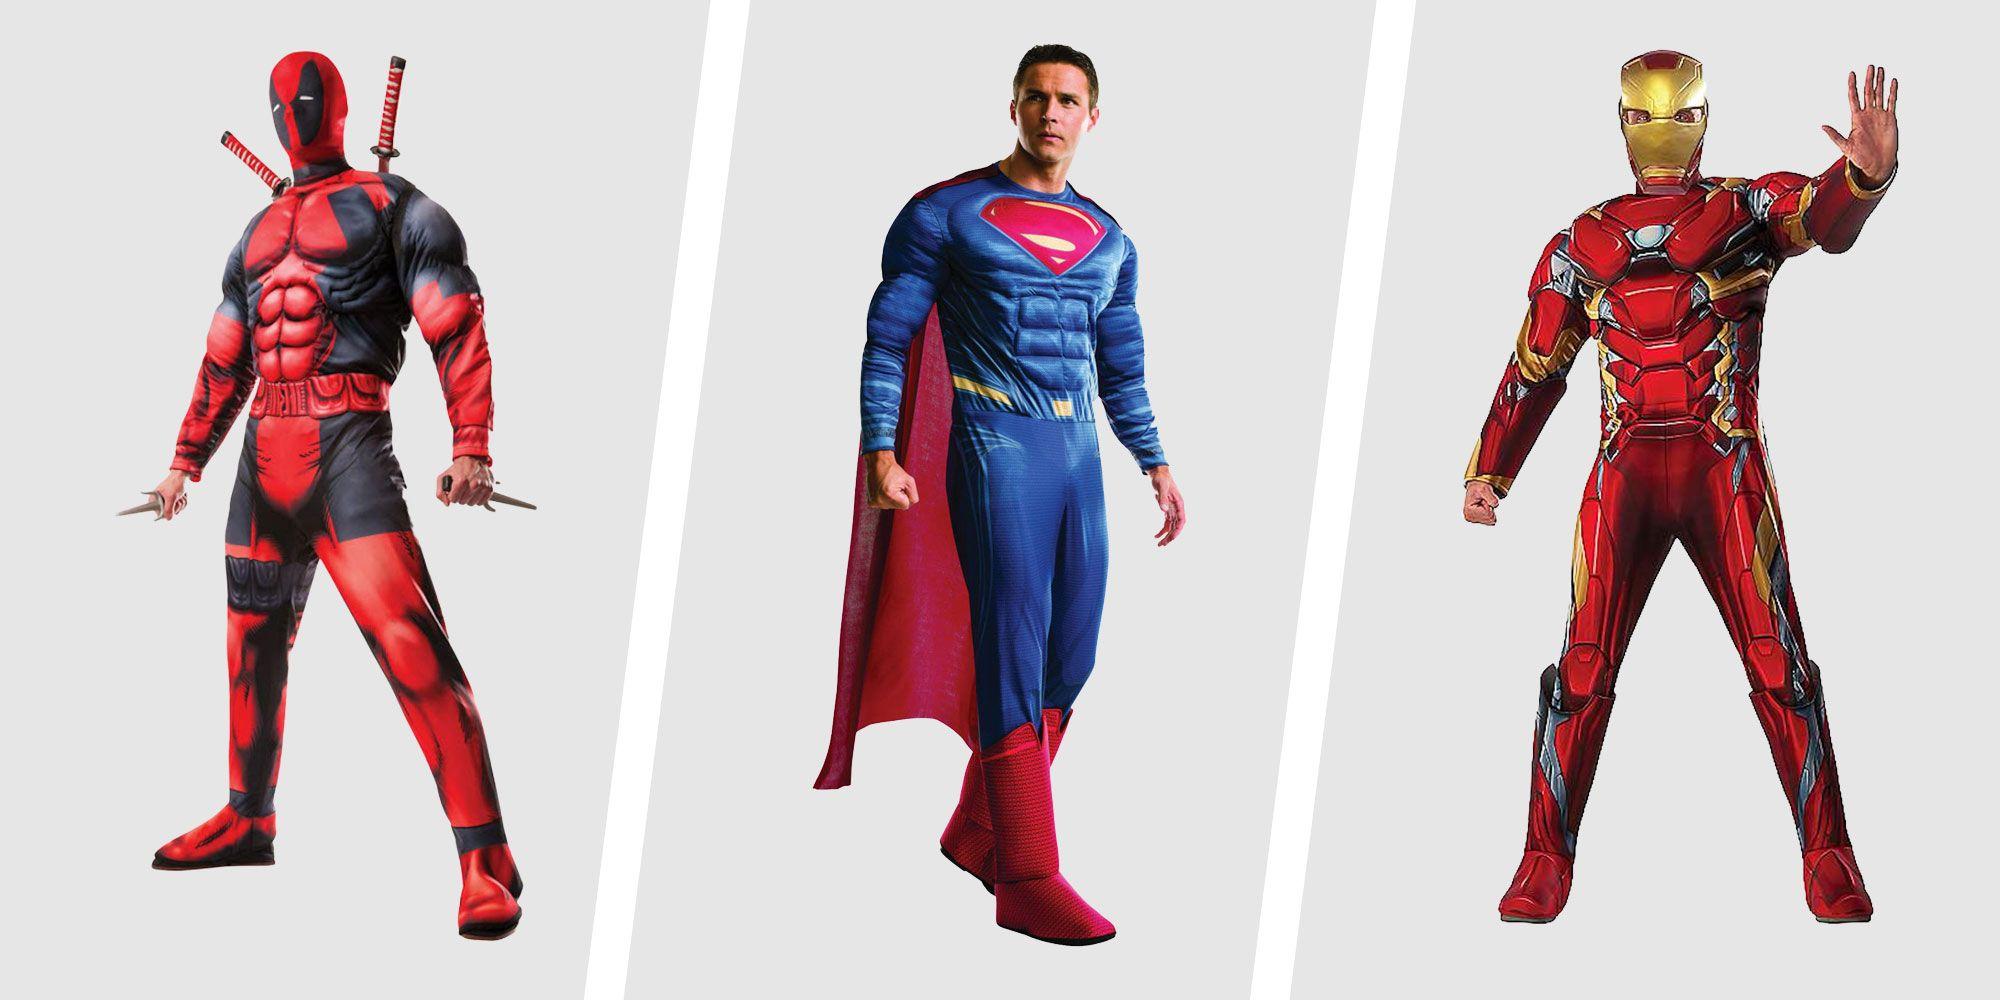 e0fa538d6 25 Best Adult Superhero Halloween Costumes For Men 2019